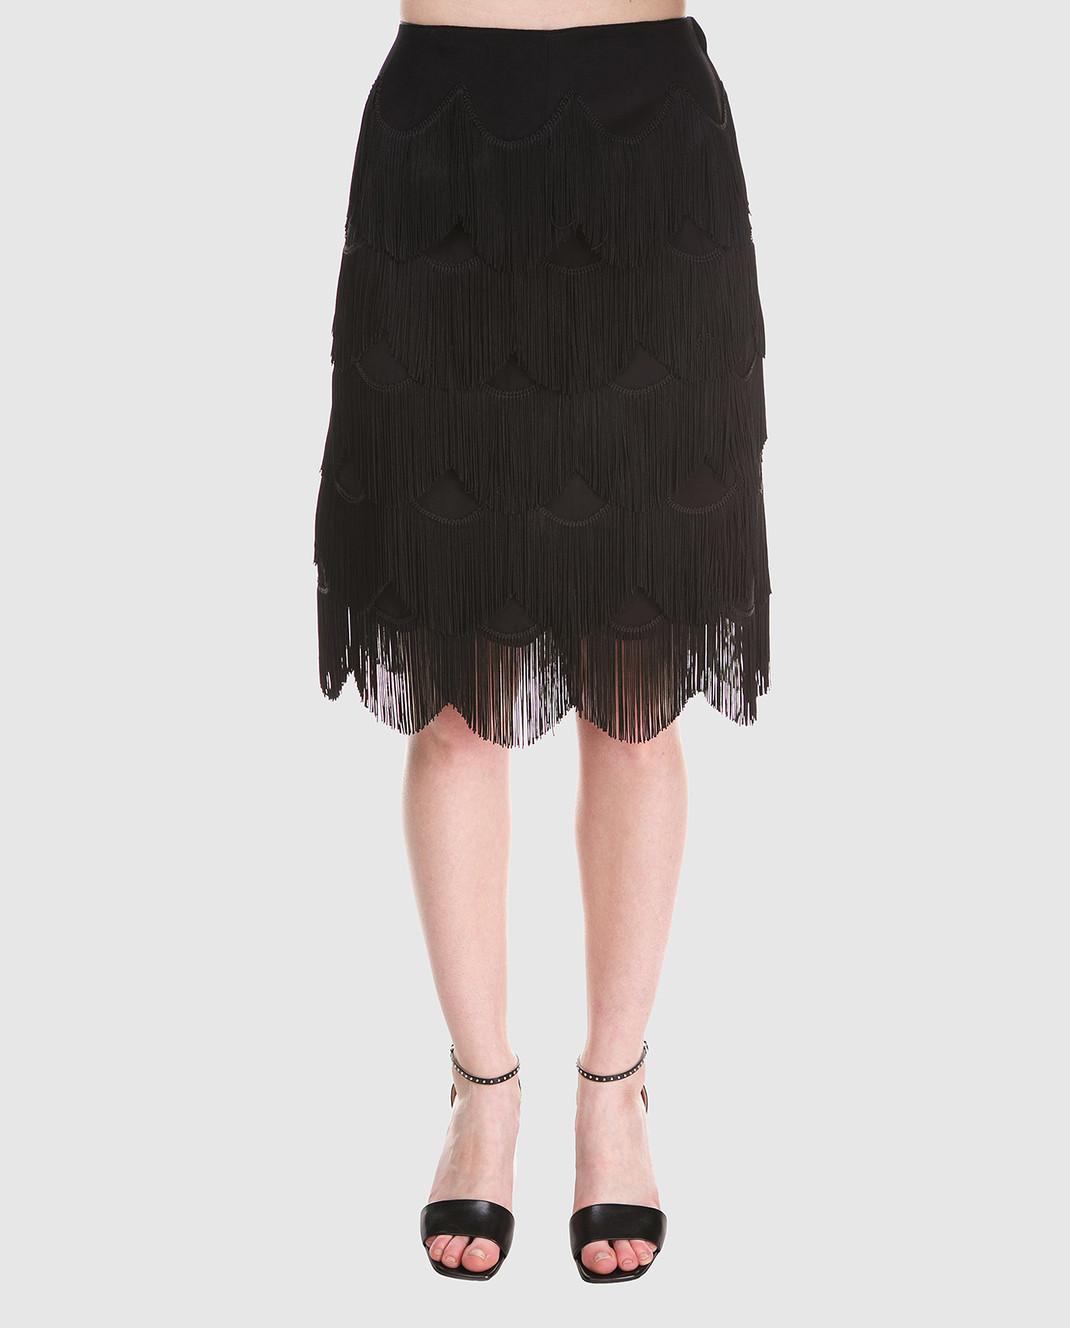 Marc Jacobs Черная юбка с бахромой M4007189 изображение 3